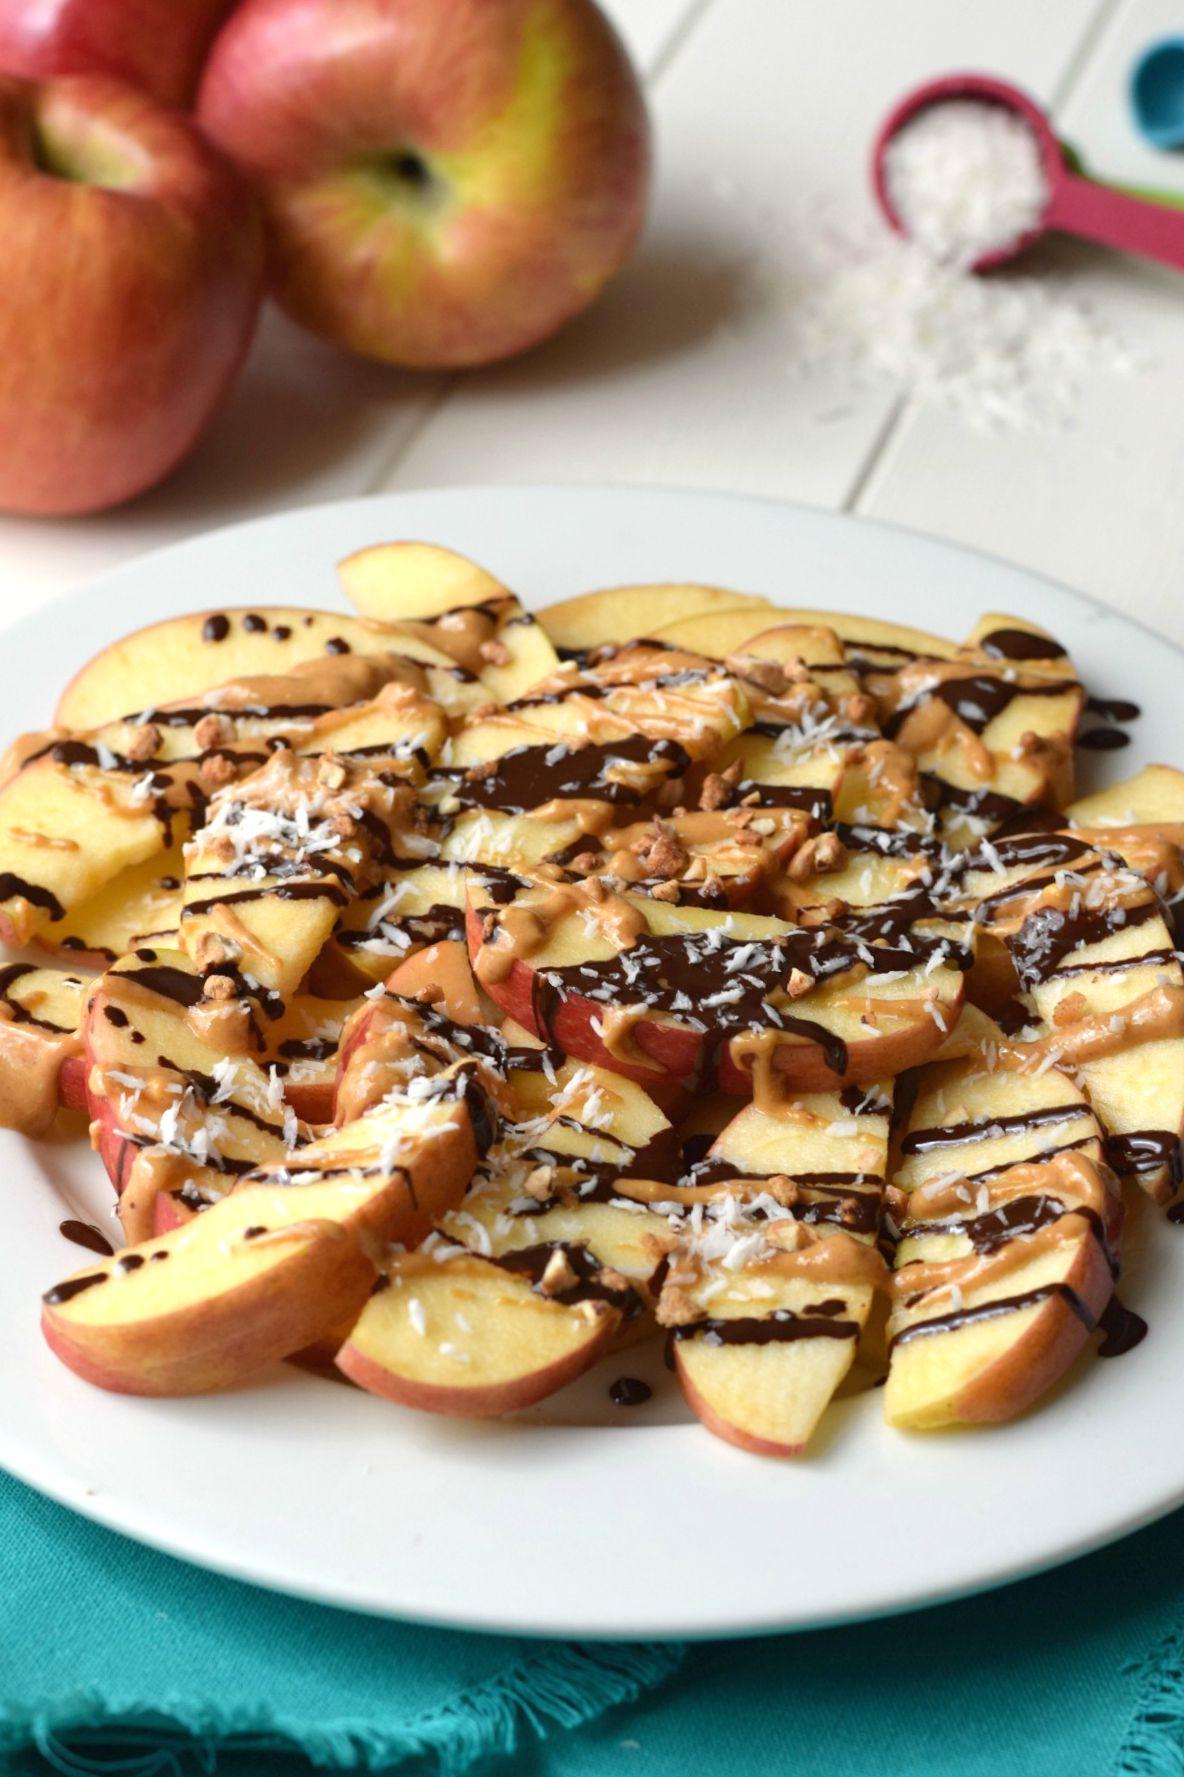 Peanut Butter Healthy Snacks  Dark Chocolate Peanut Butter Apples Feel Great in 8 Blog